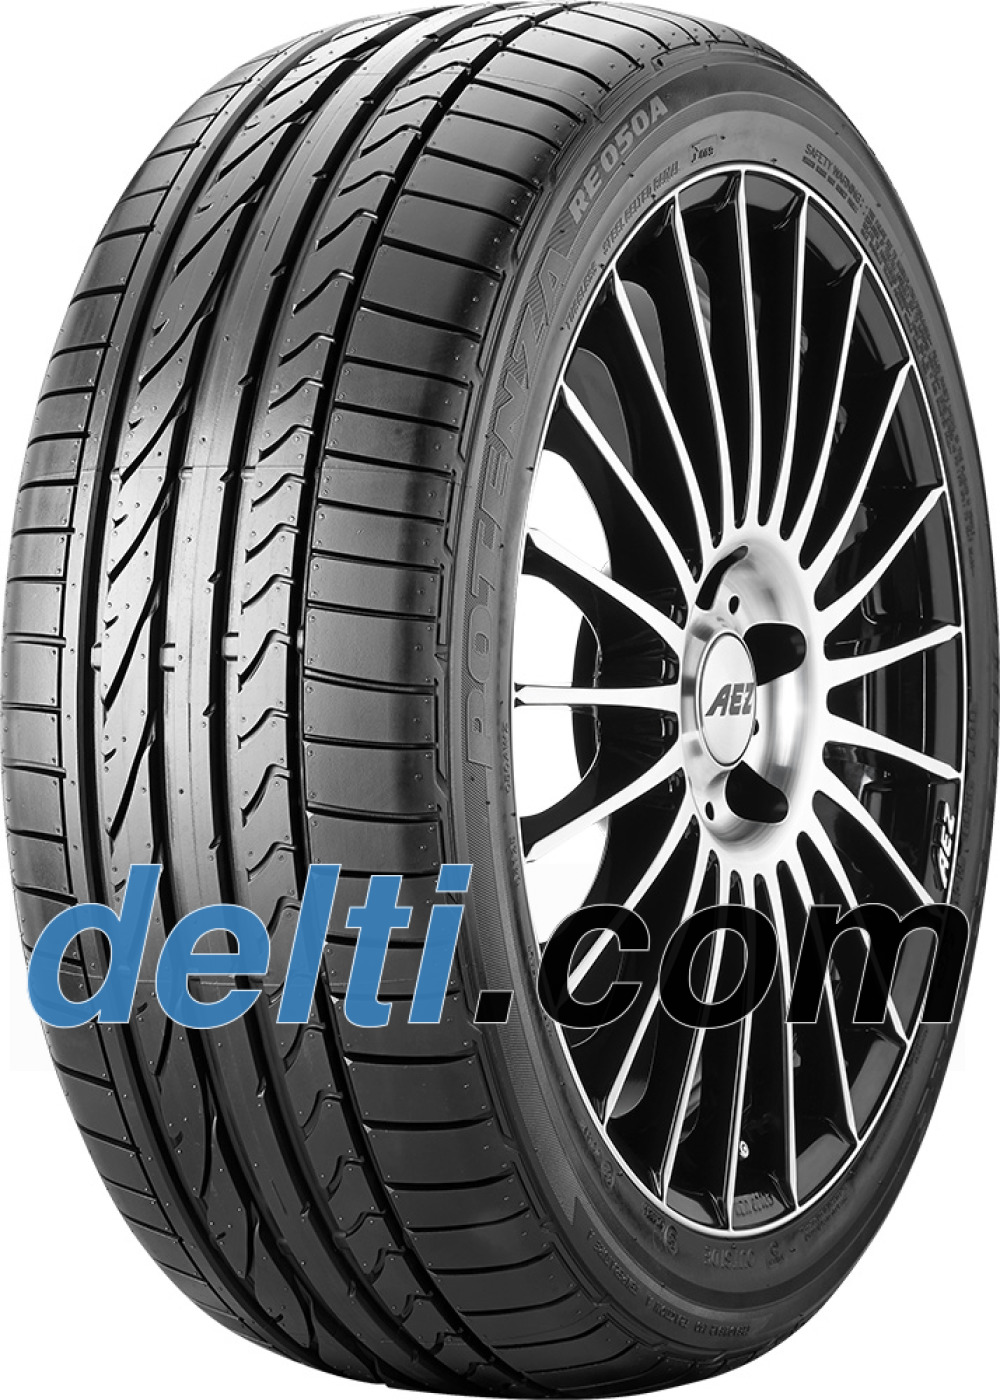 Bridgestone Potenza RE 050 A ( 205/45 R17 88W XL med fälg skyddslist (MFS) )